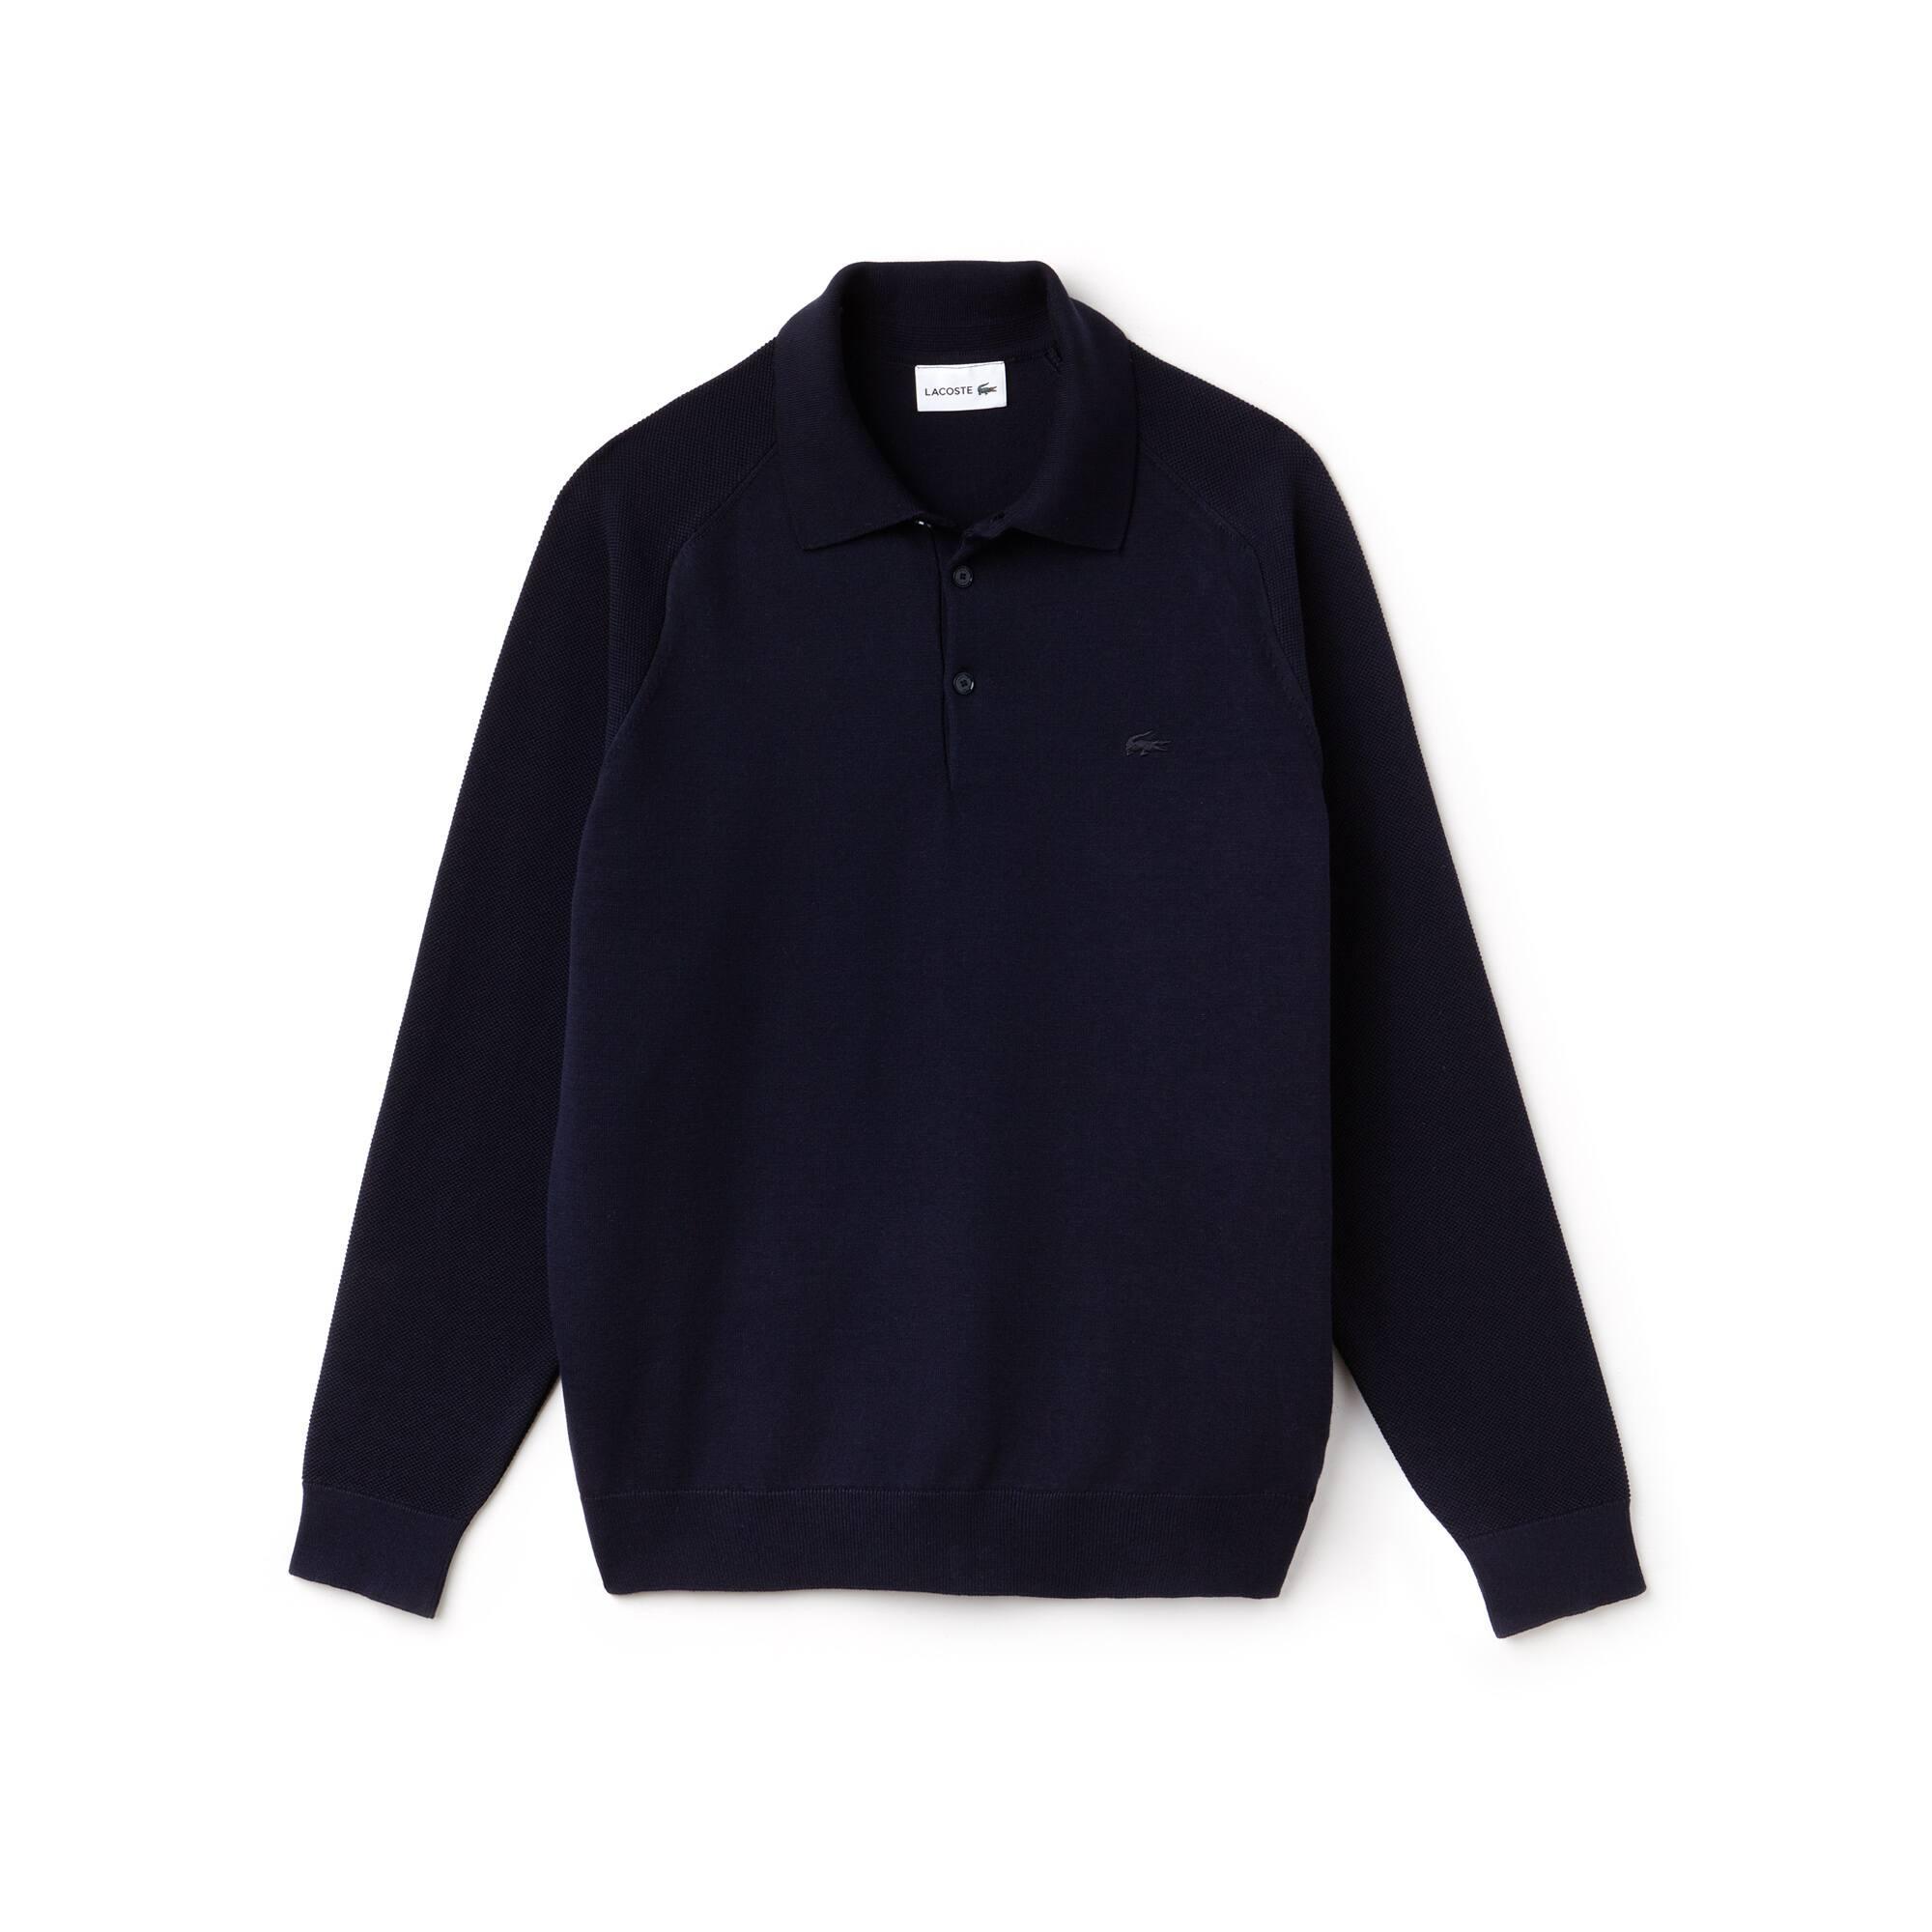 Jersey cuello polo de punto técnico con mangas contrastantes